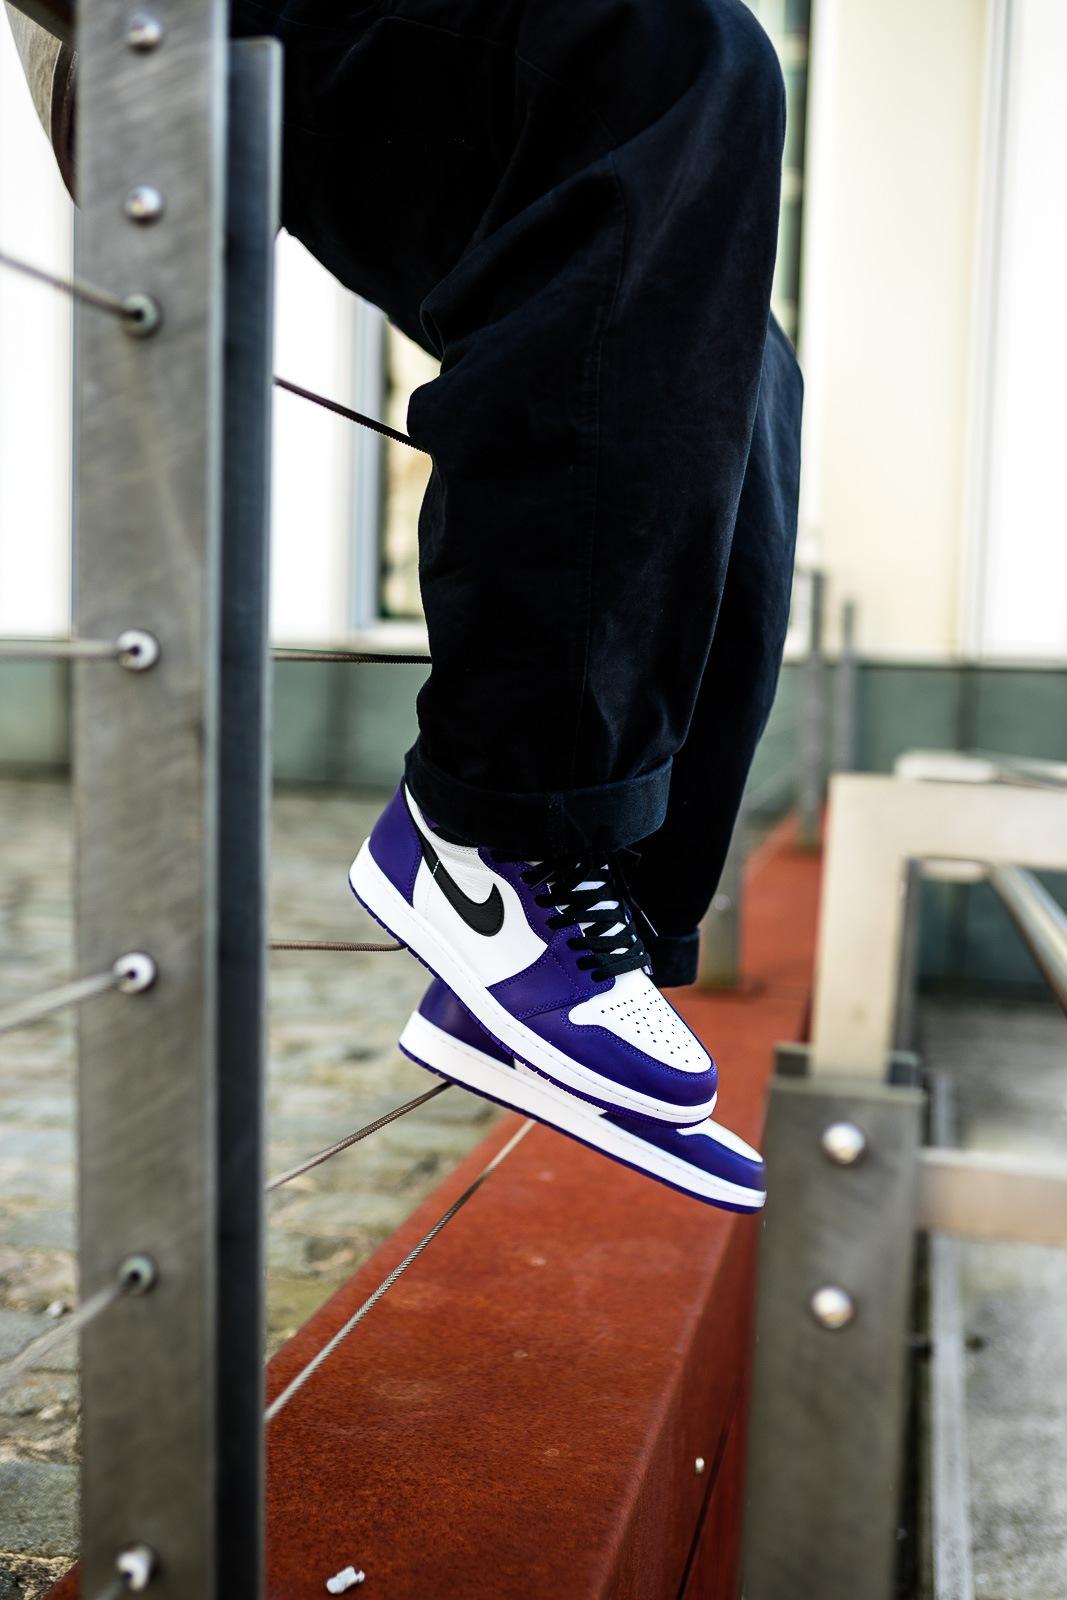 Nike Air Jordan 1 Court Purple - on feet | Dead Stock